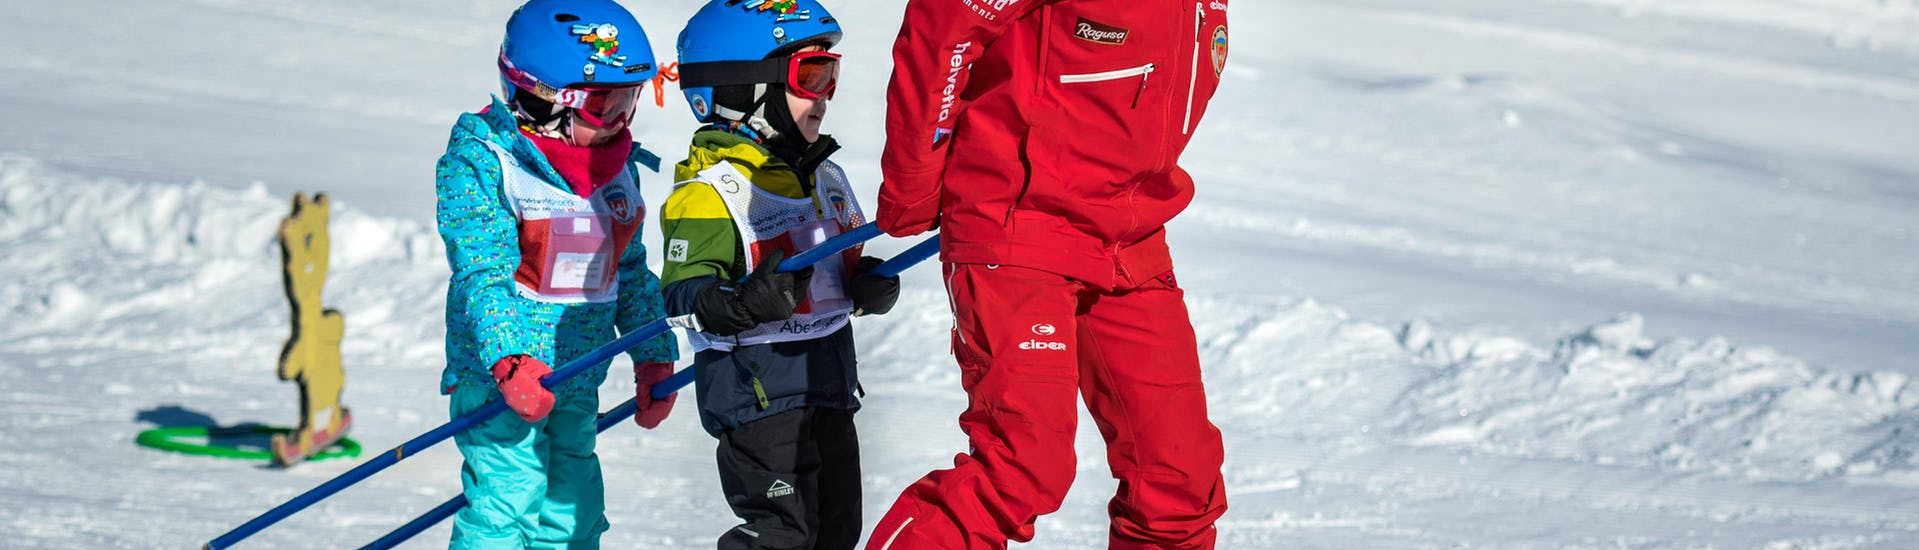 "Kinder Skikurs ""Bambini"" (3-5 J.) - Anfänger"